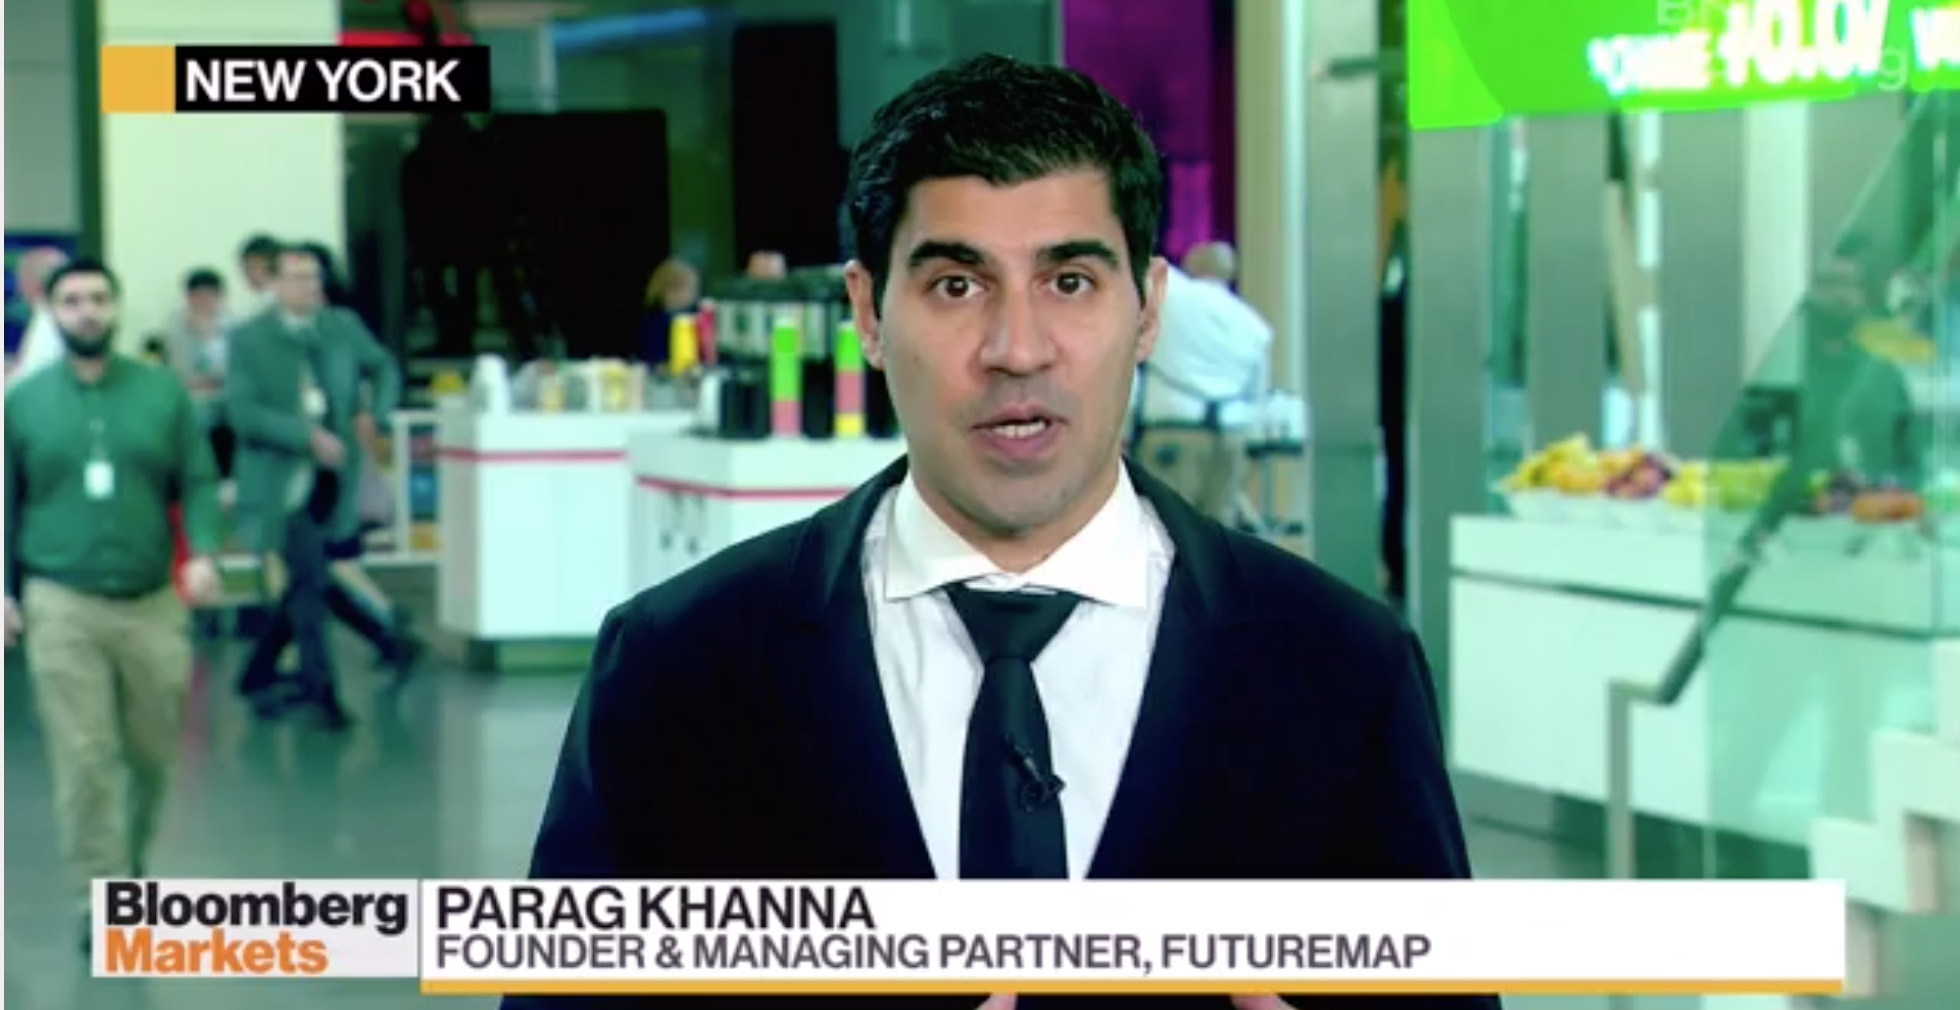 Parag Khanna BNN Bloomberg .JPG